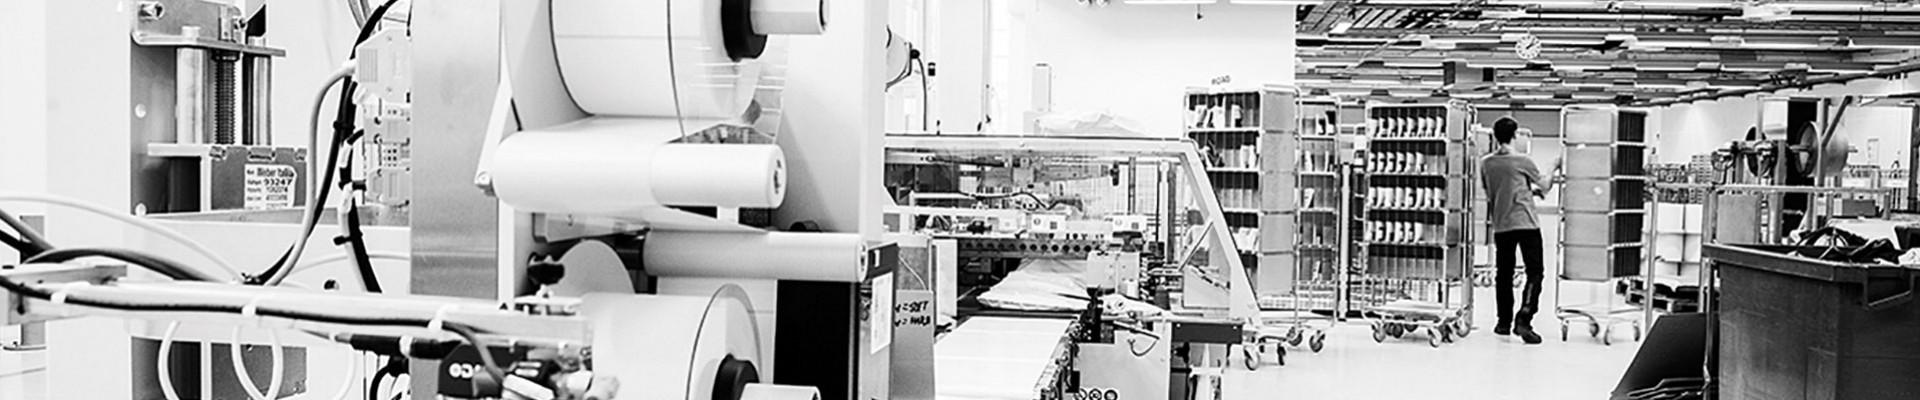 Axla Logistics tuotanto